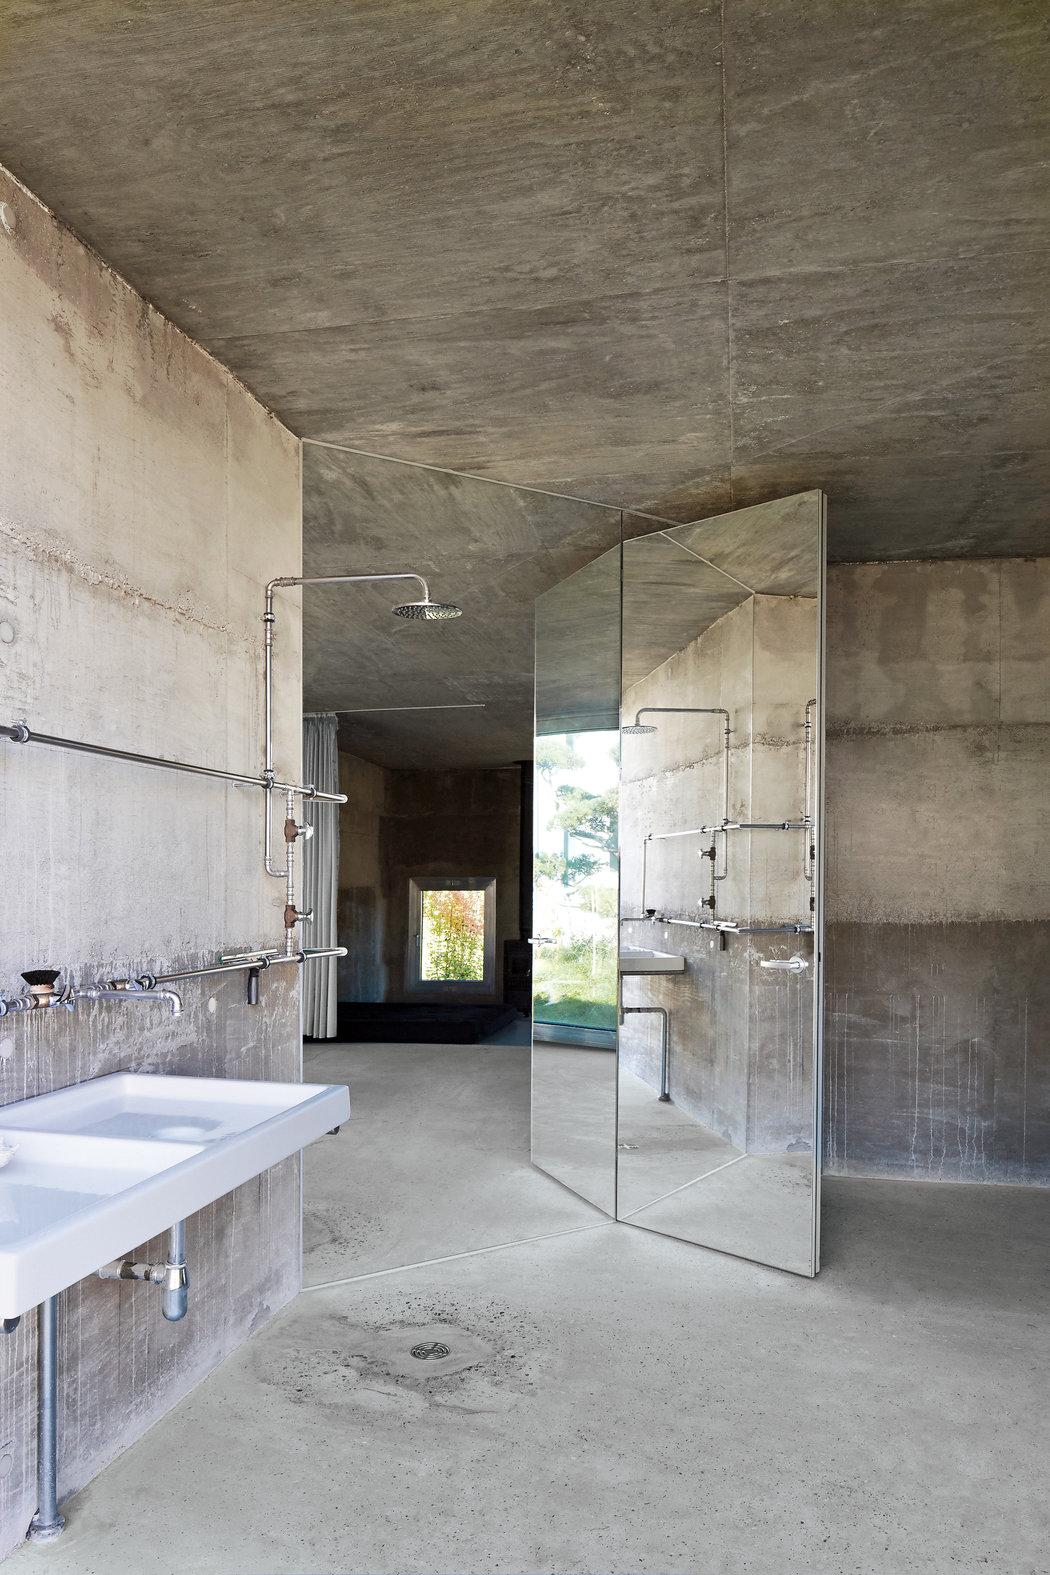 brutalist-architecture-slide-ZZ6I-master1050.jpg